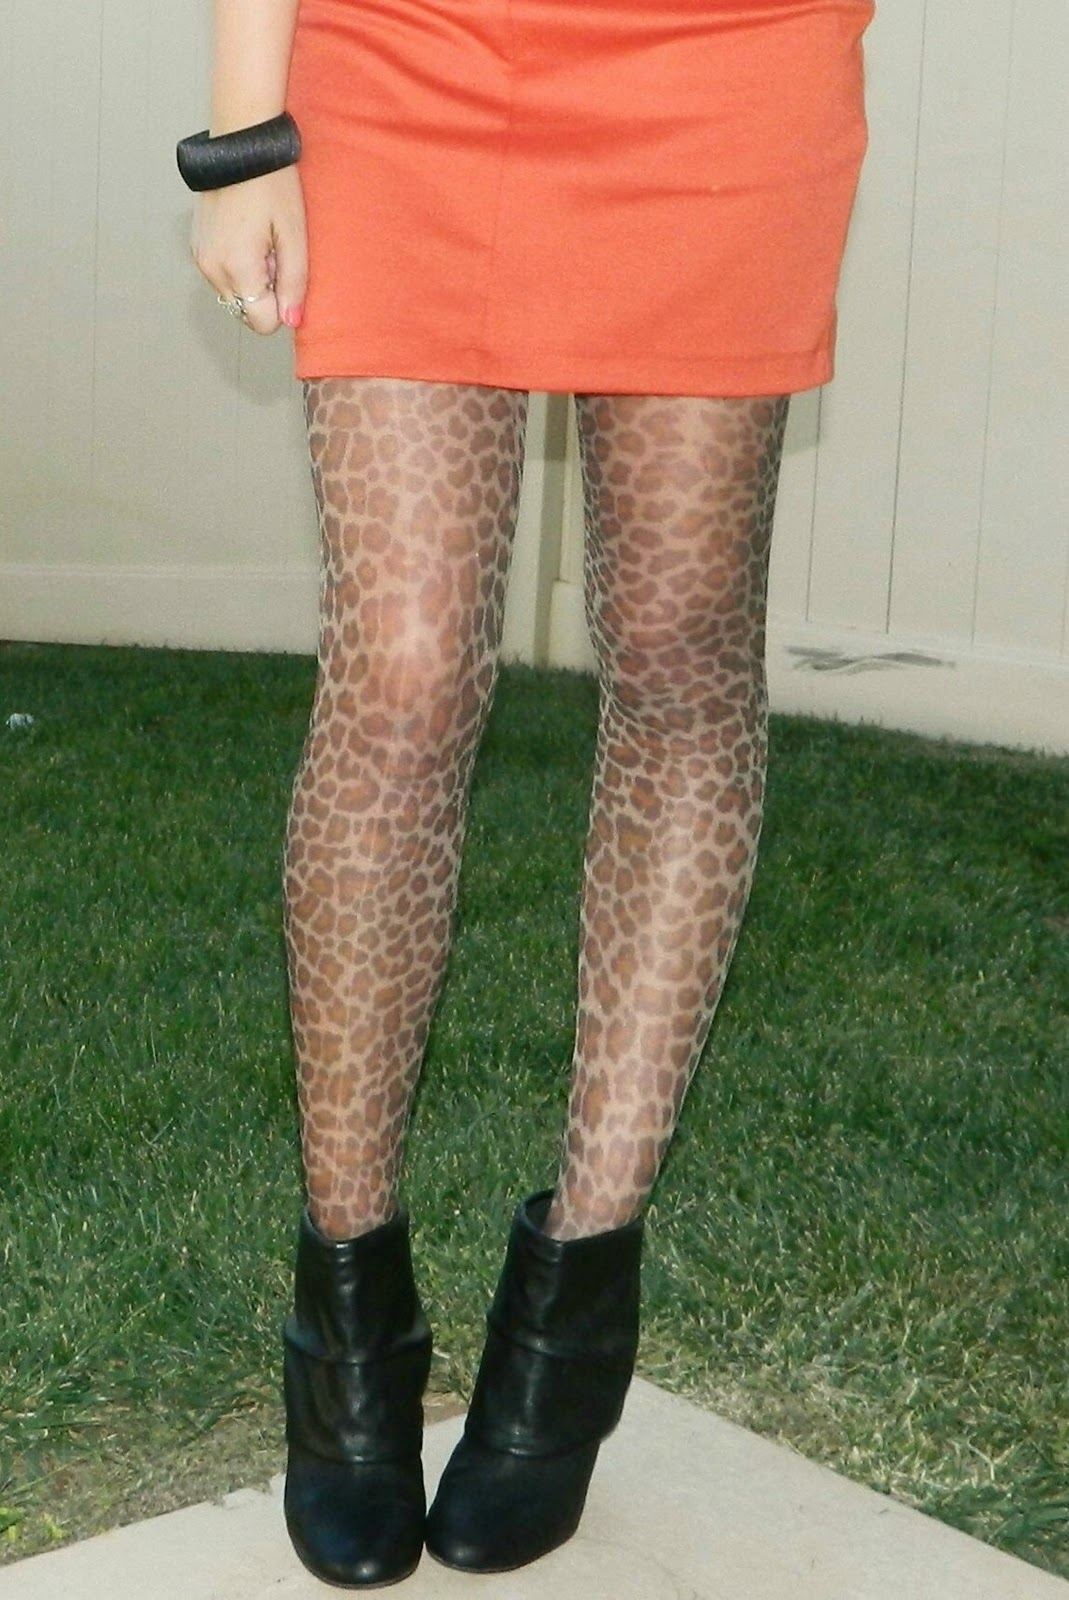 Black booties, leopard print tights